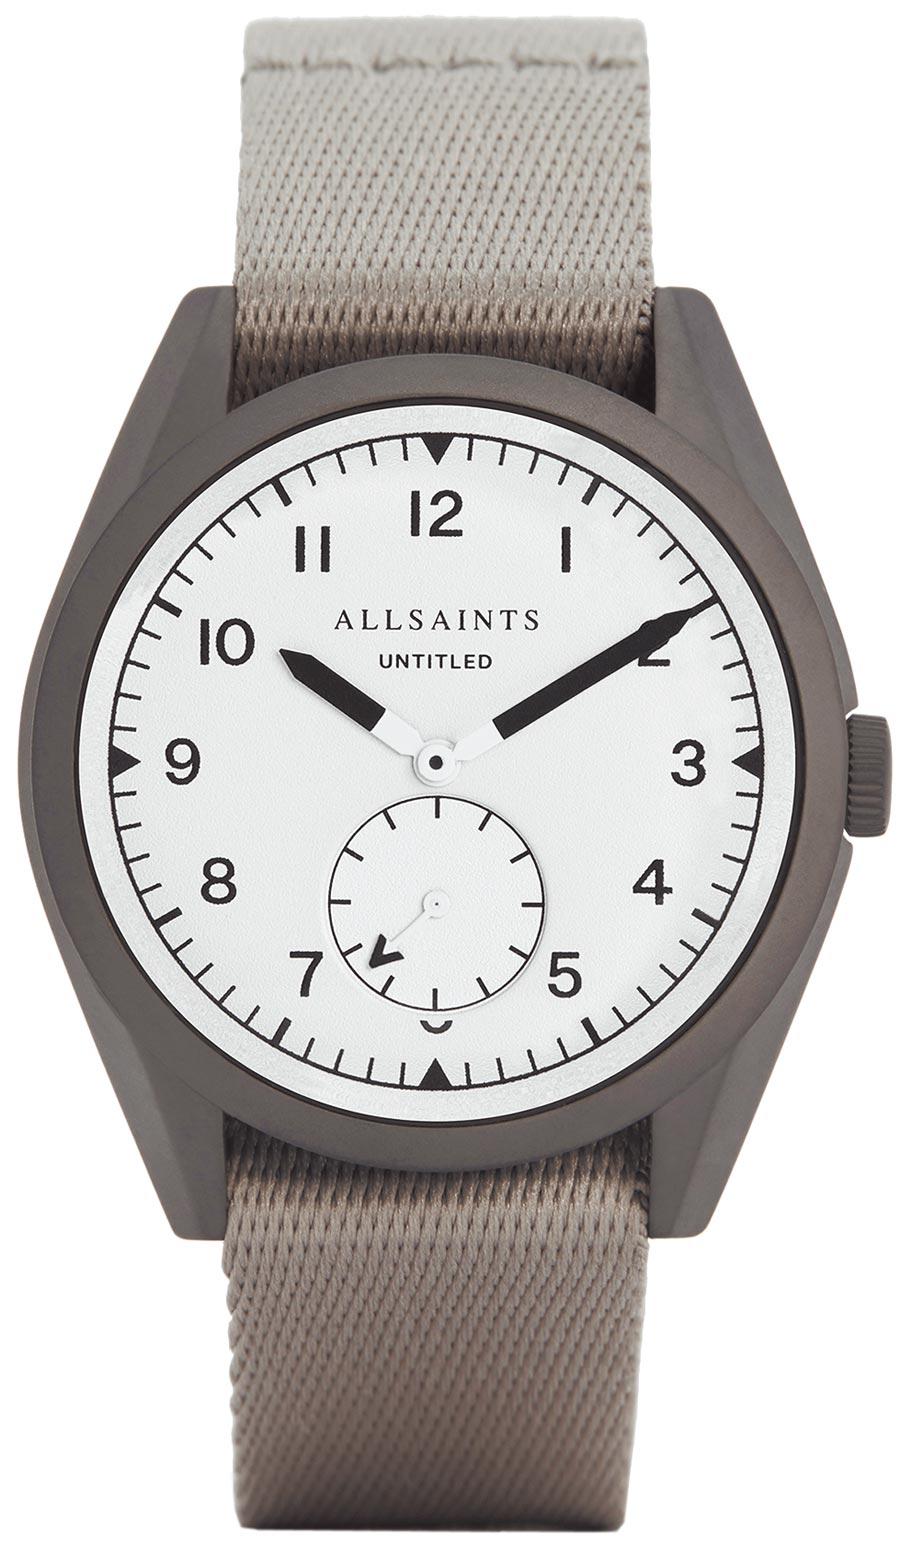 AllSaints UNTITLED II腕表,7100元。(AllSaints提供)